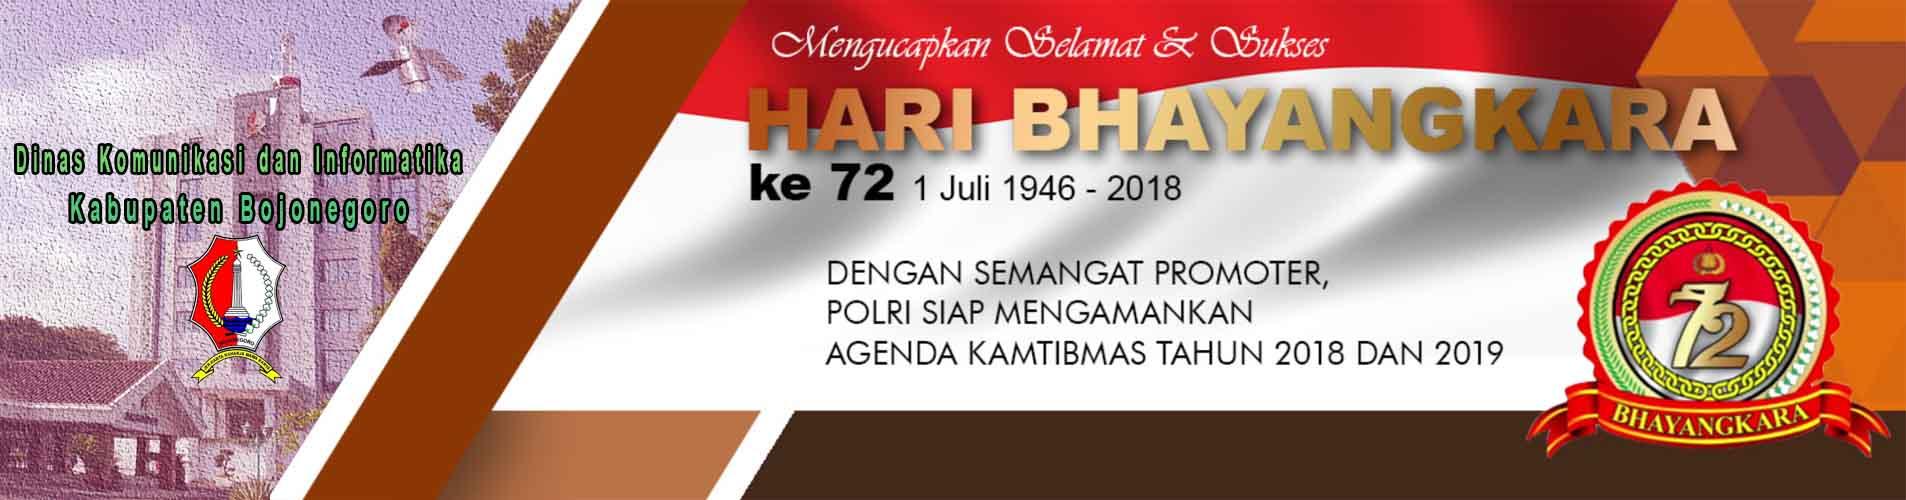 Selamat & Sukses<BR>Hari Bhayangkara ke-72